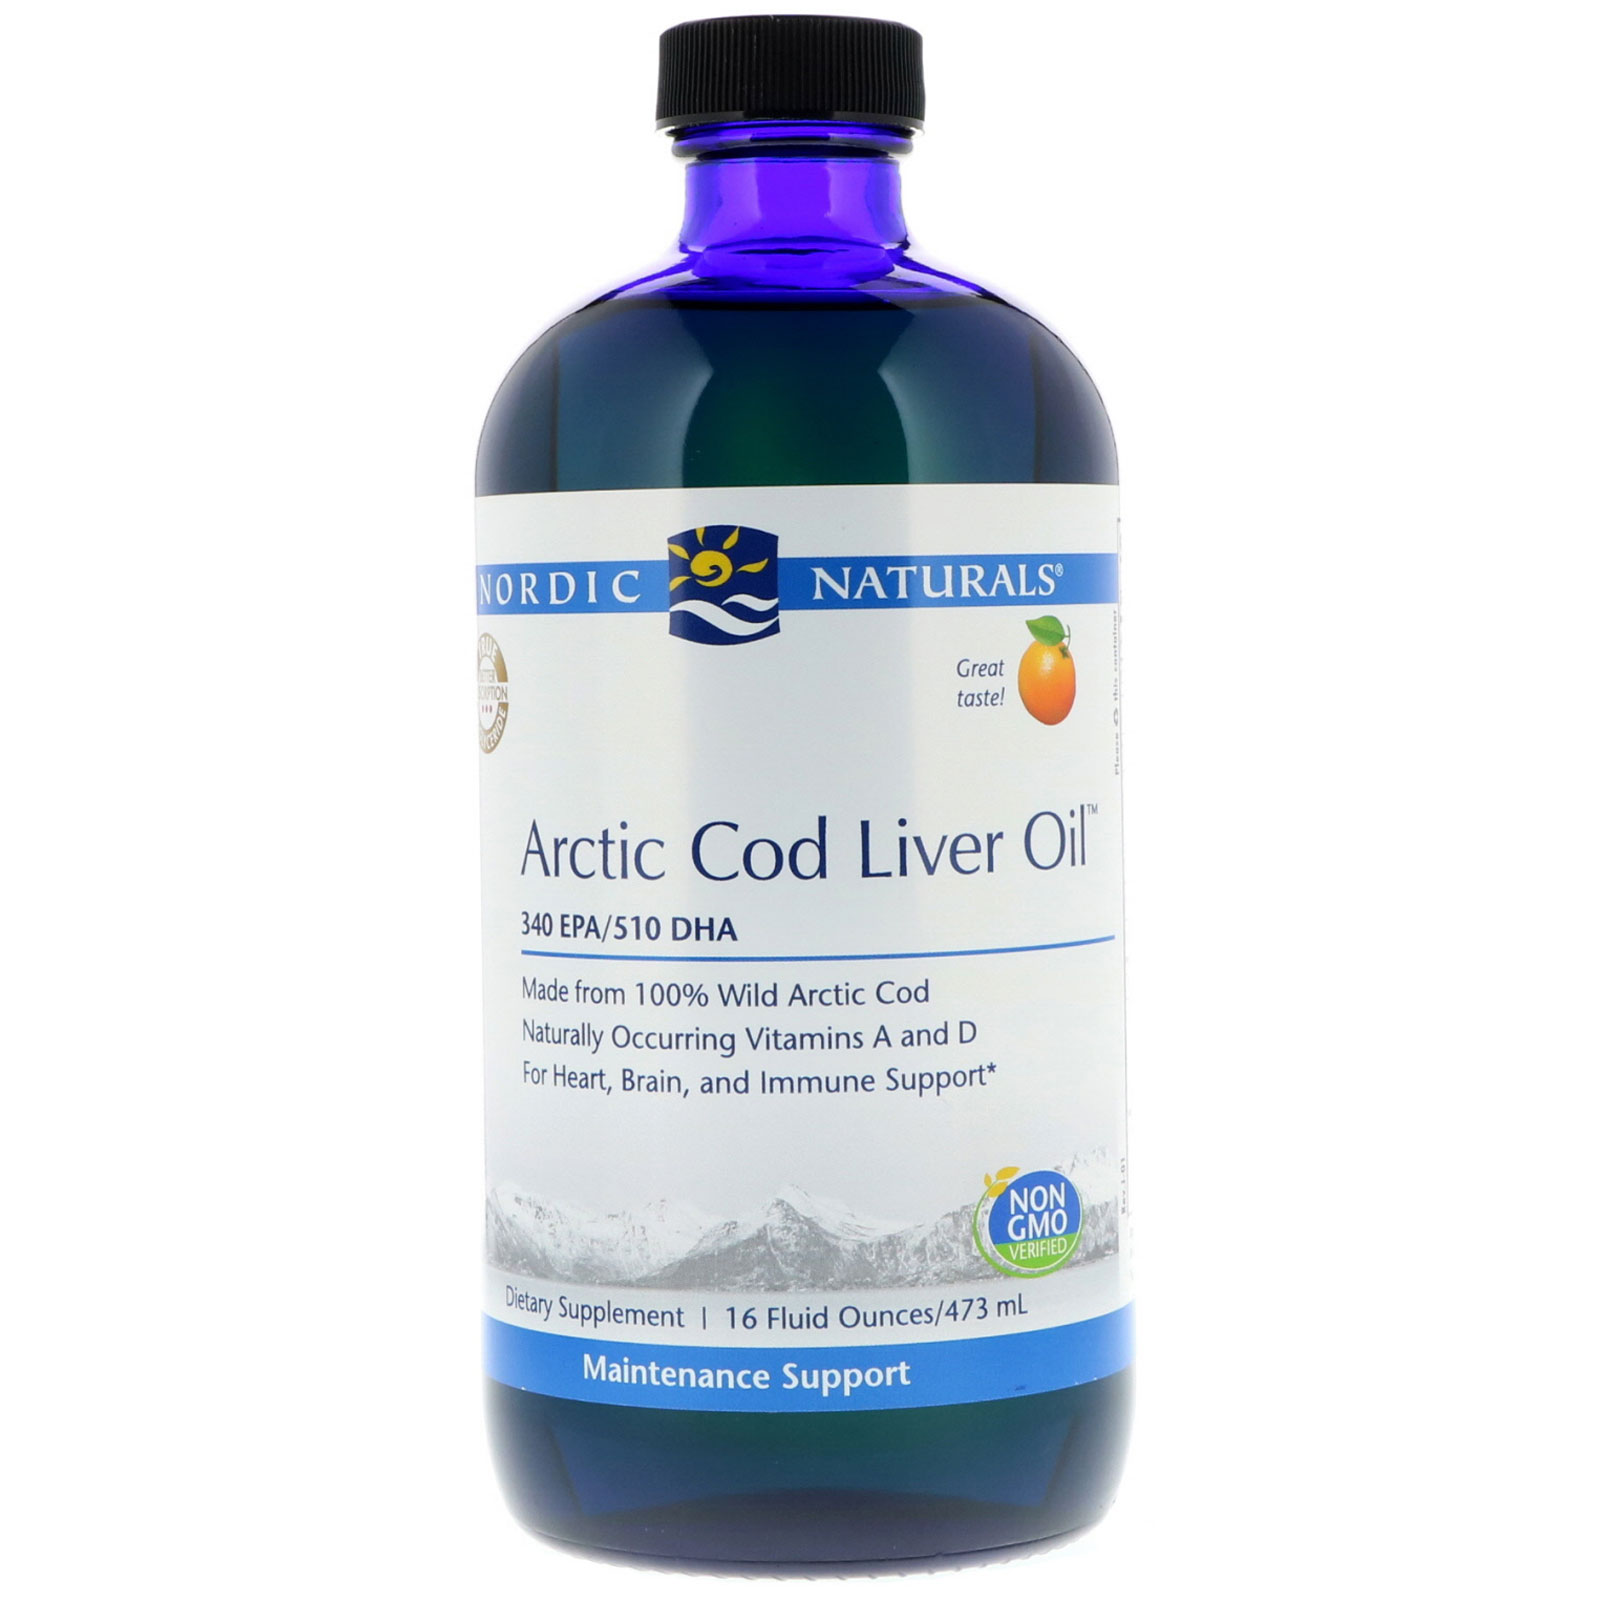 Nordic Naturals Arctic Cod Liver Oil Orange Flavor